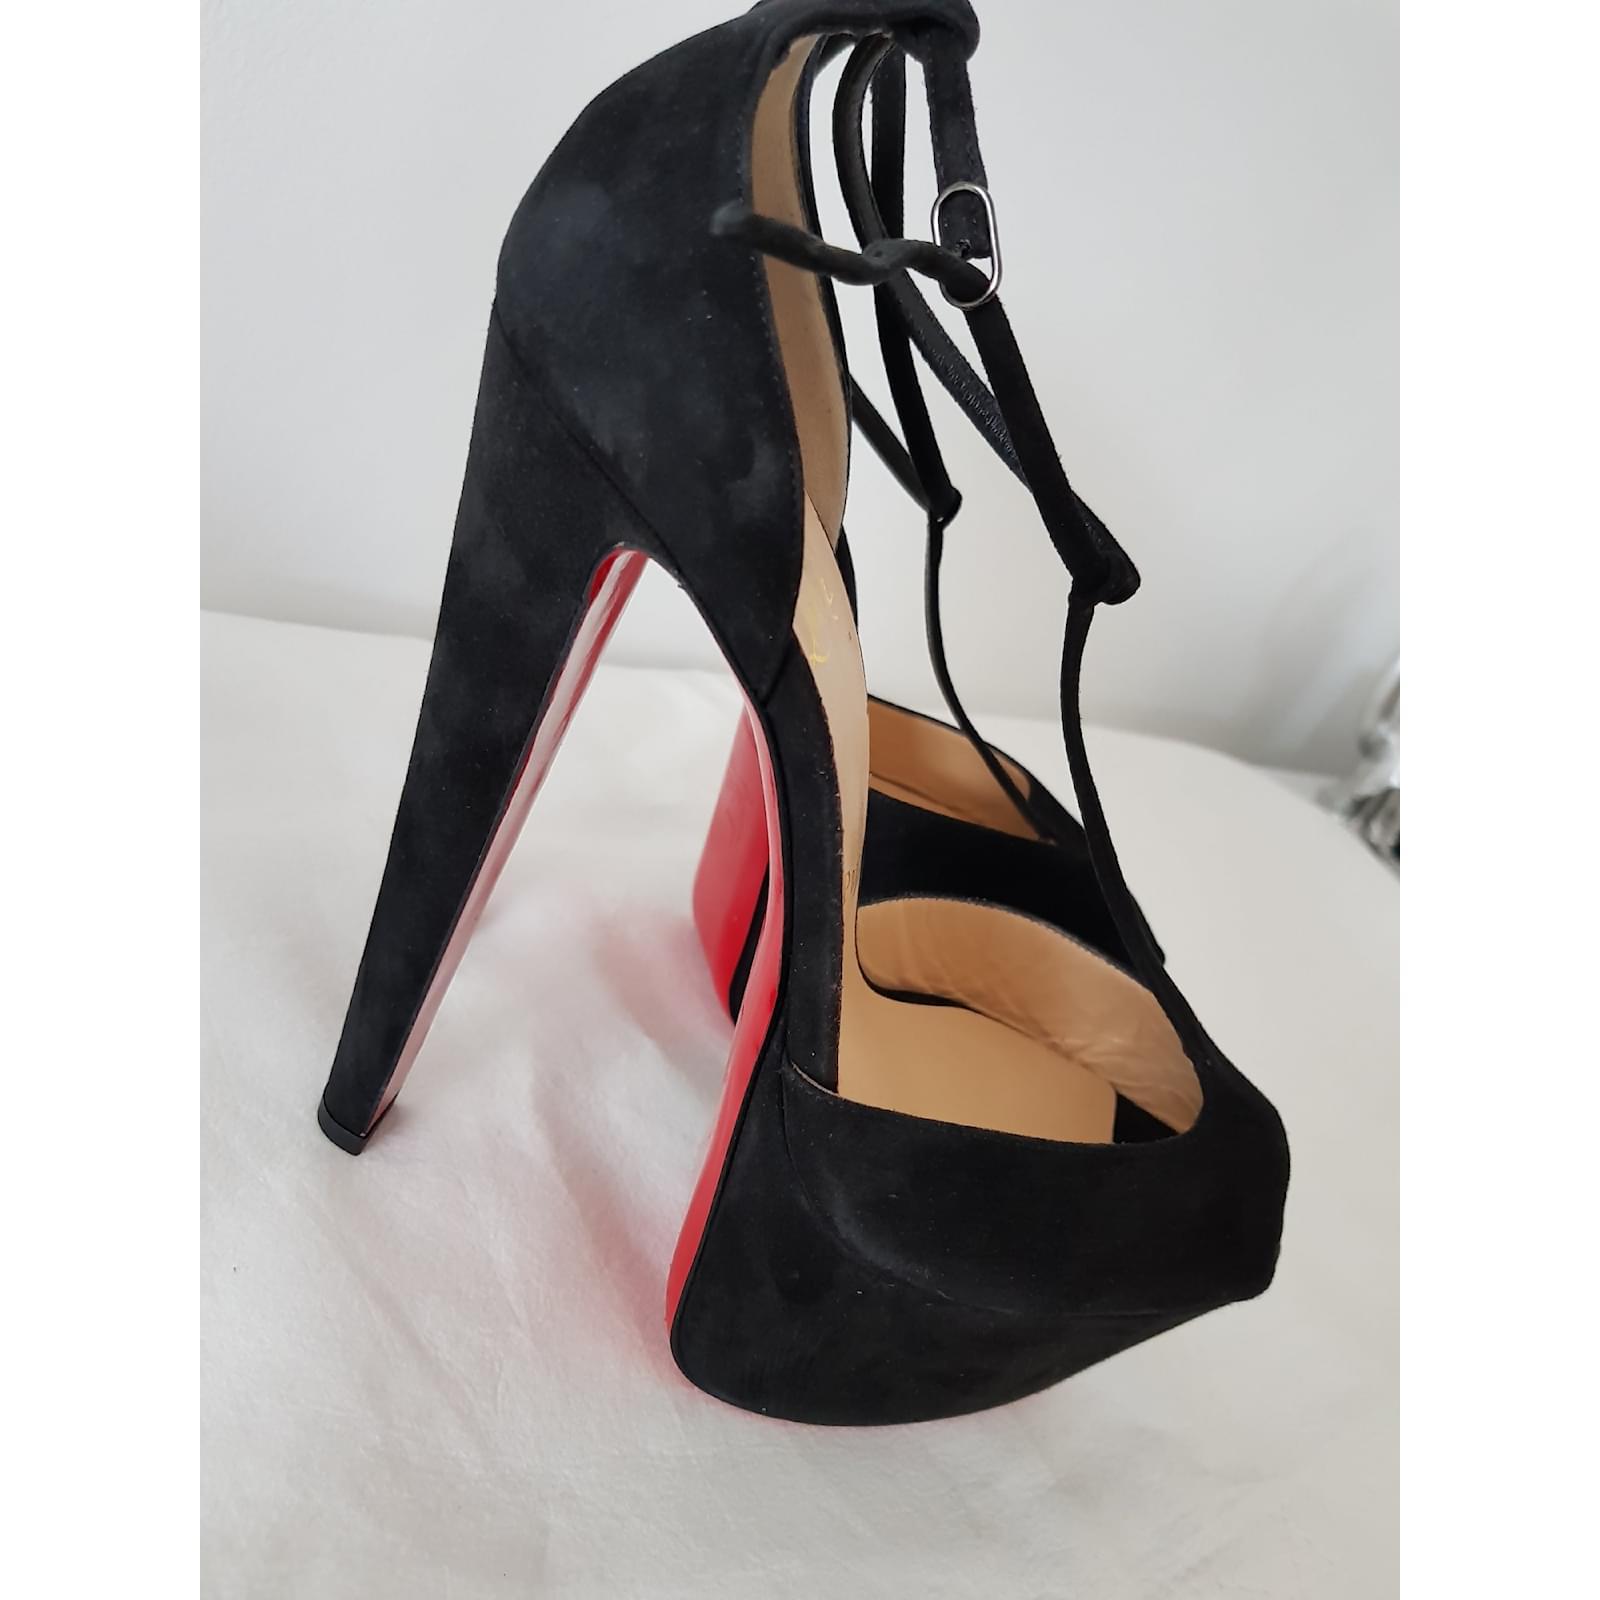 outlet store 0803a 1c5d6 Christian Louboutin Alta Poppin platform shoes uk 6 39